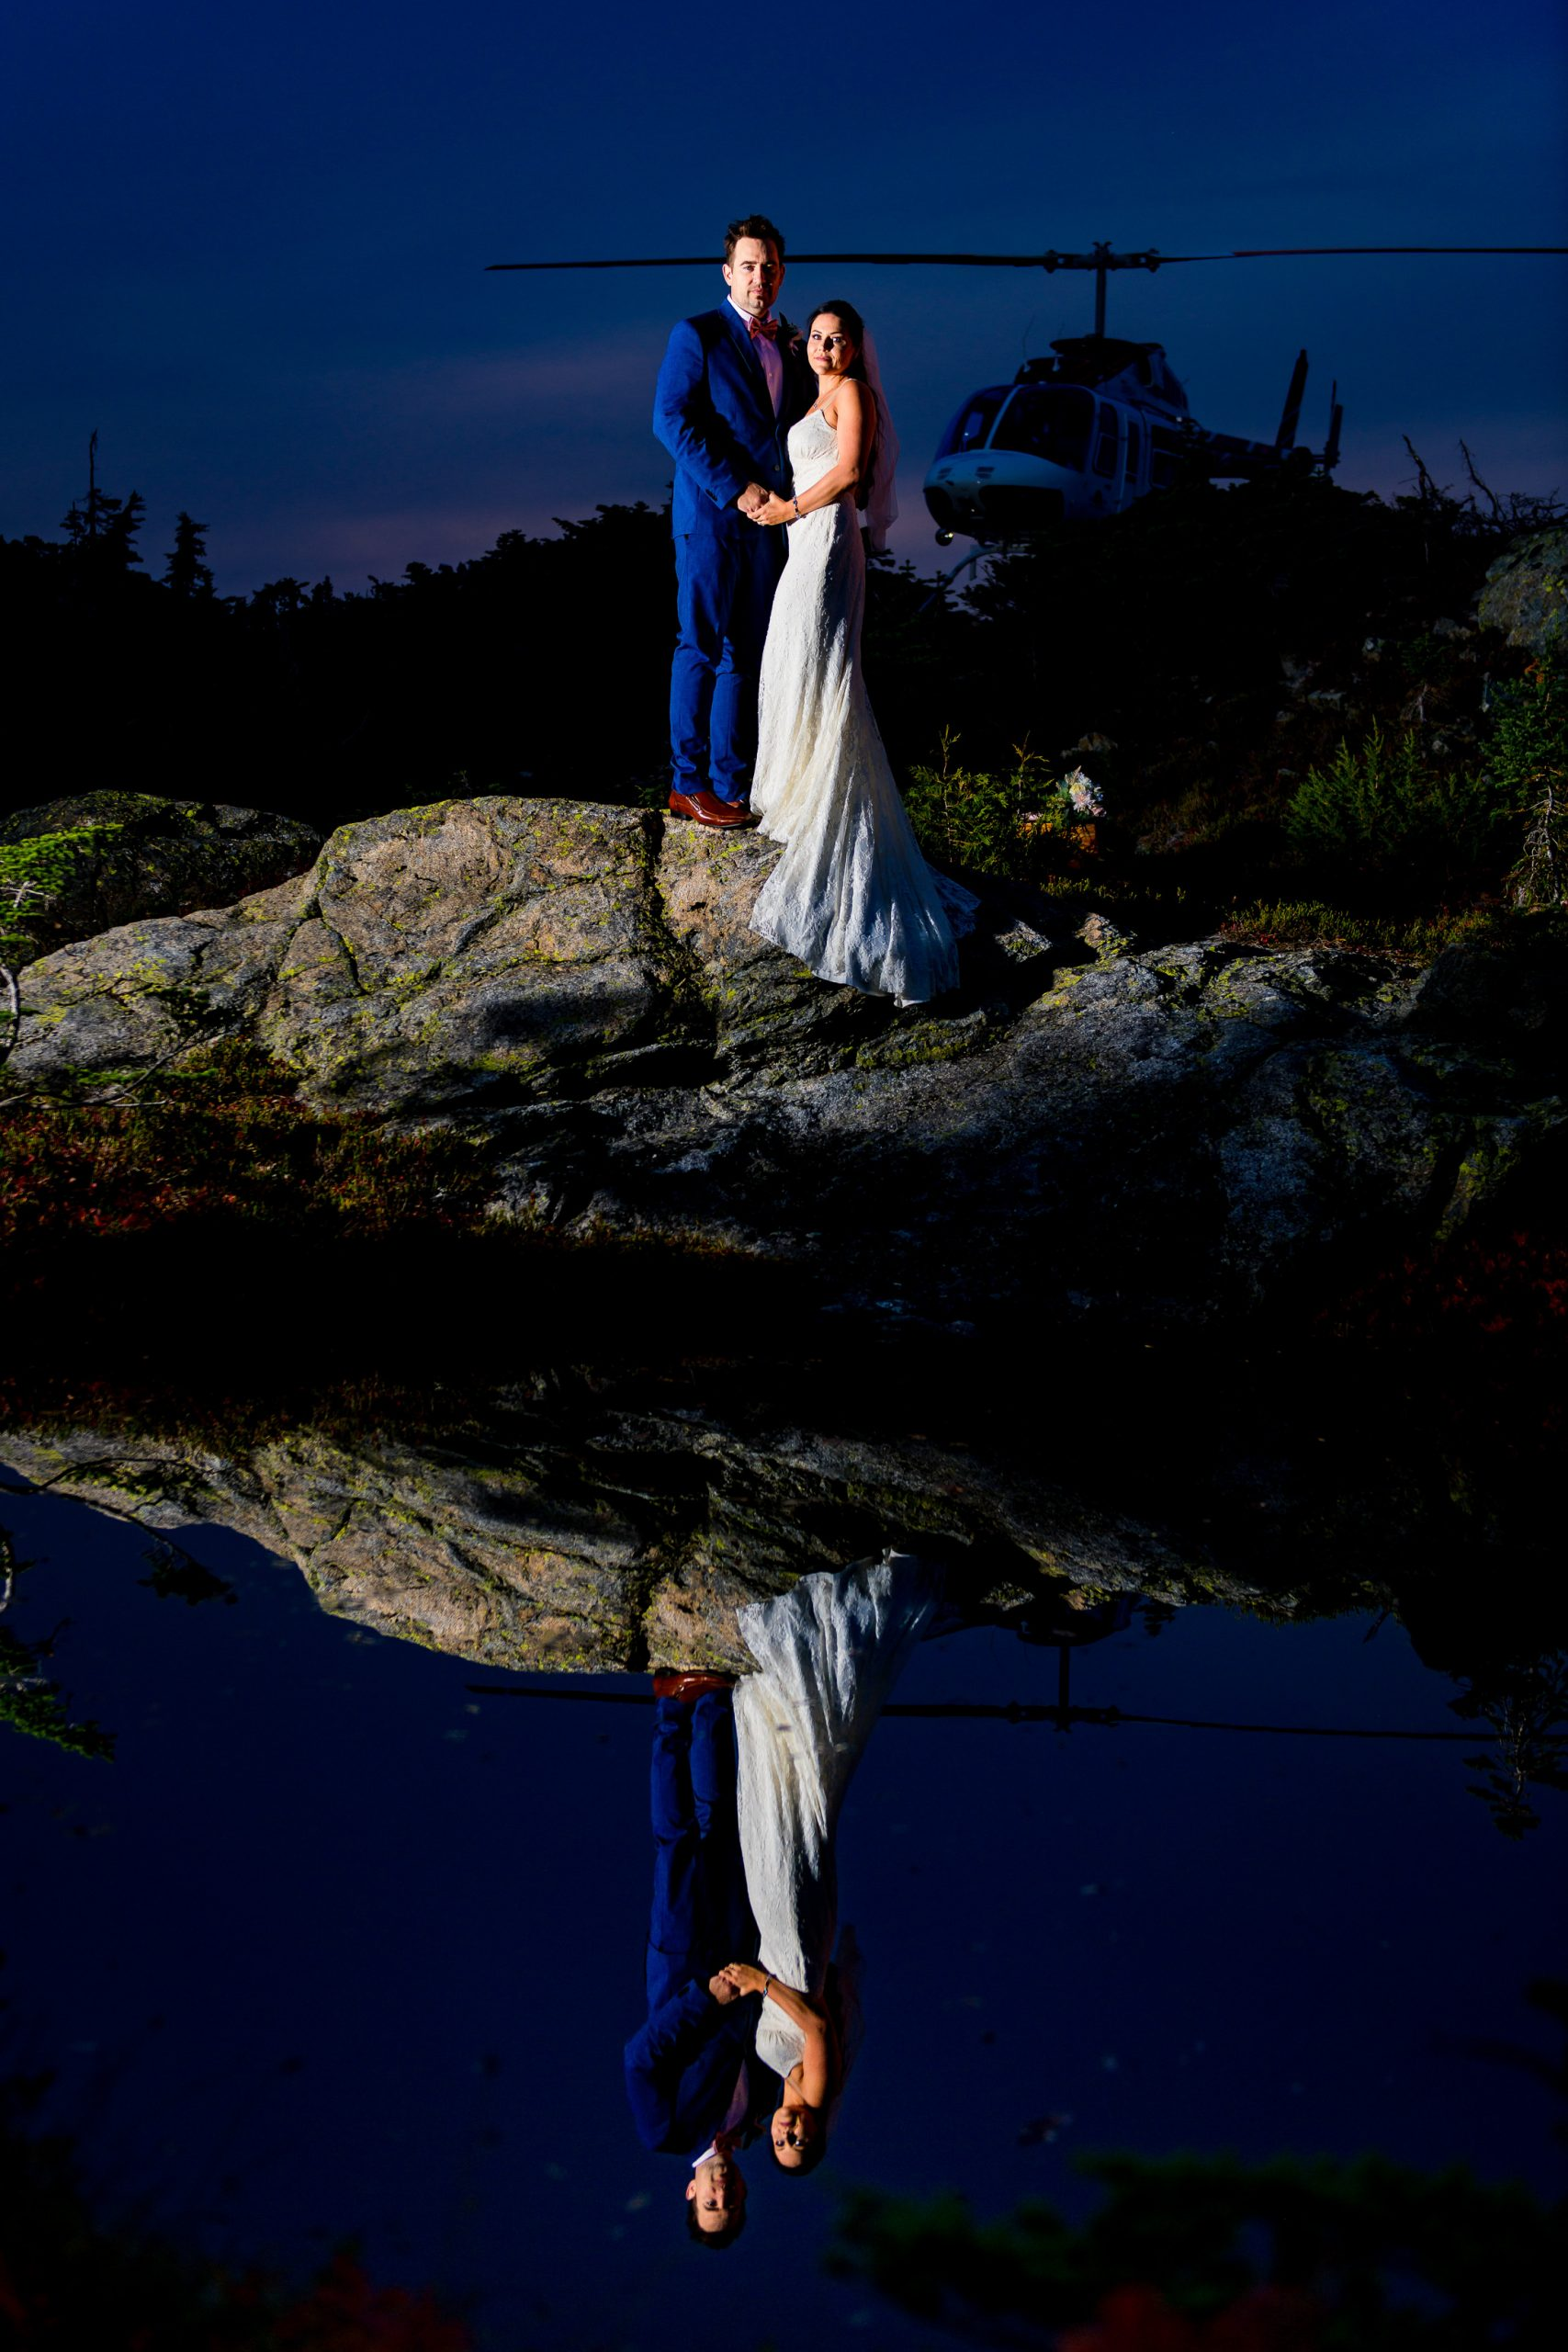 014 - night heli tour wedding